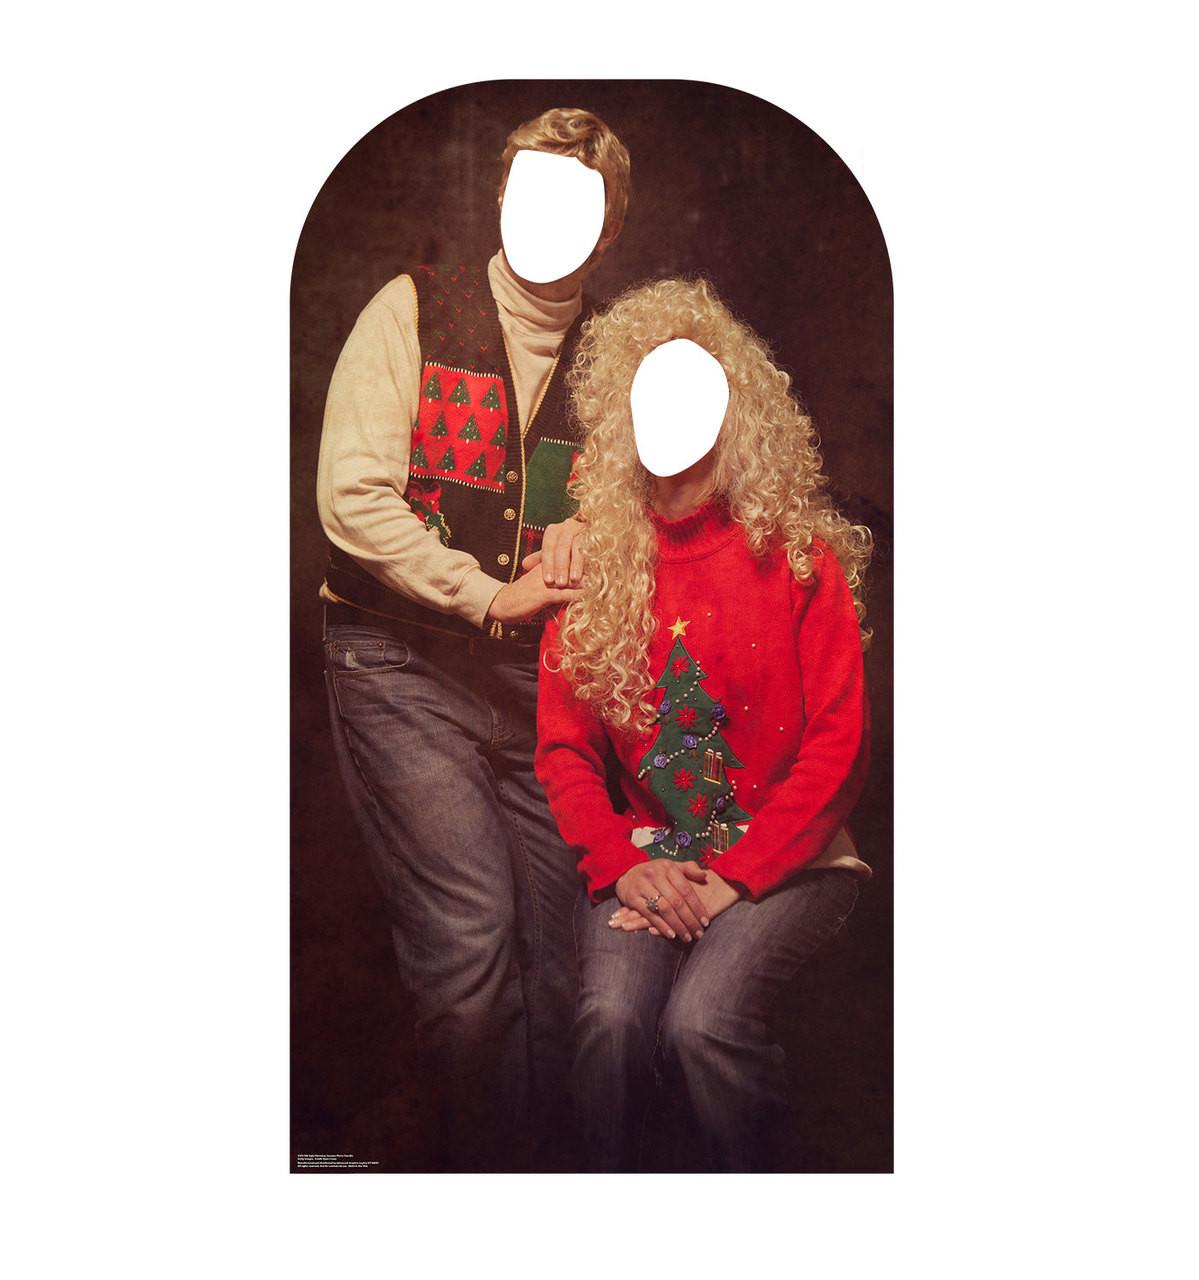 Ugly Christmas Sweater Portrait Ugly Christmas Sweater Portrait Stand-in | Cardboard CutoutStand-in